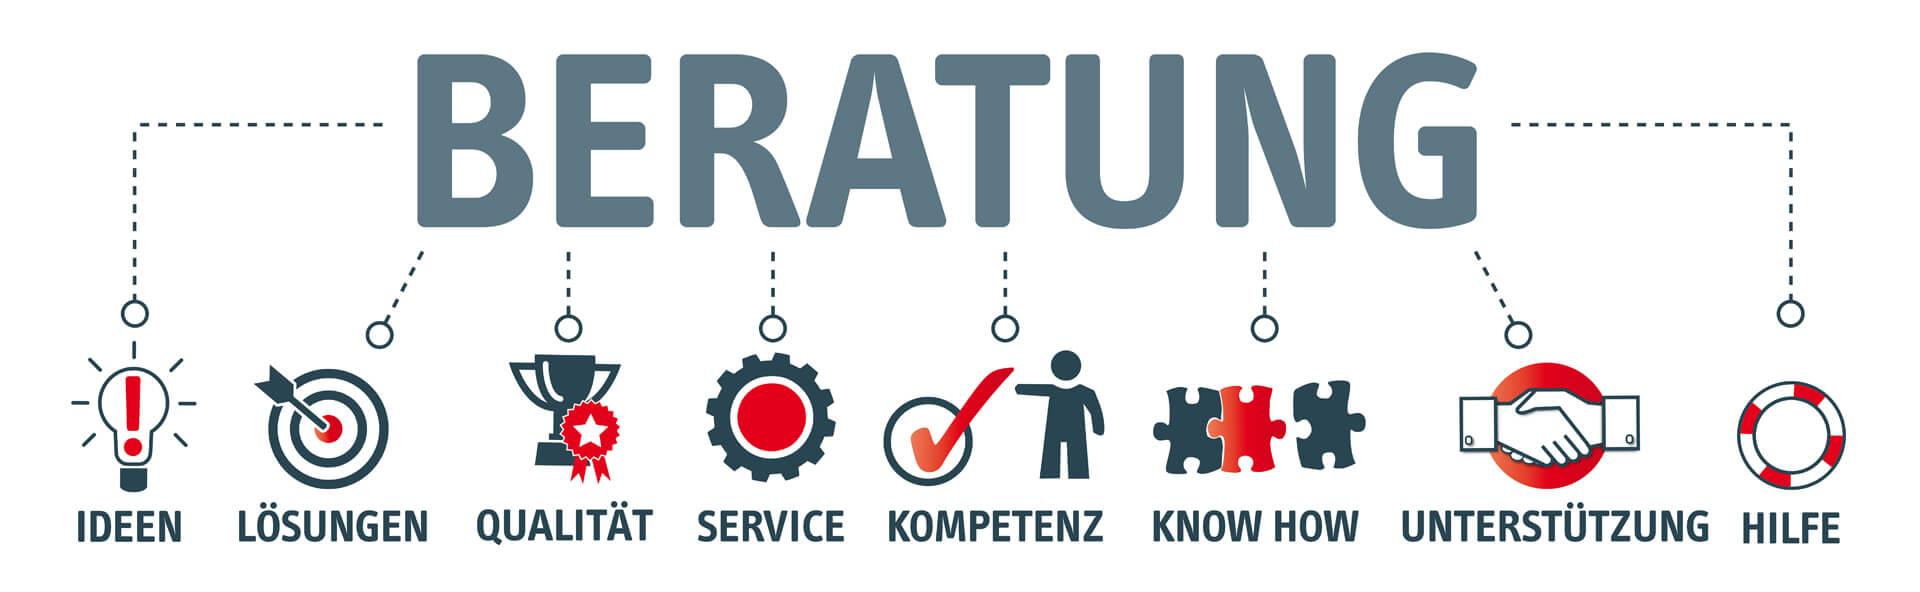 Beratung, beraten, service, business mit ACON Unternehmensberatung